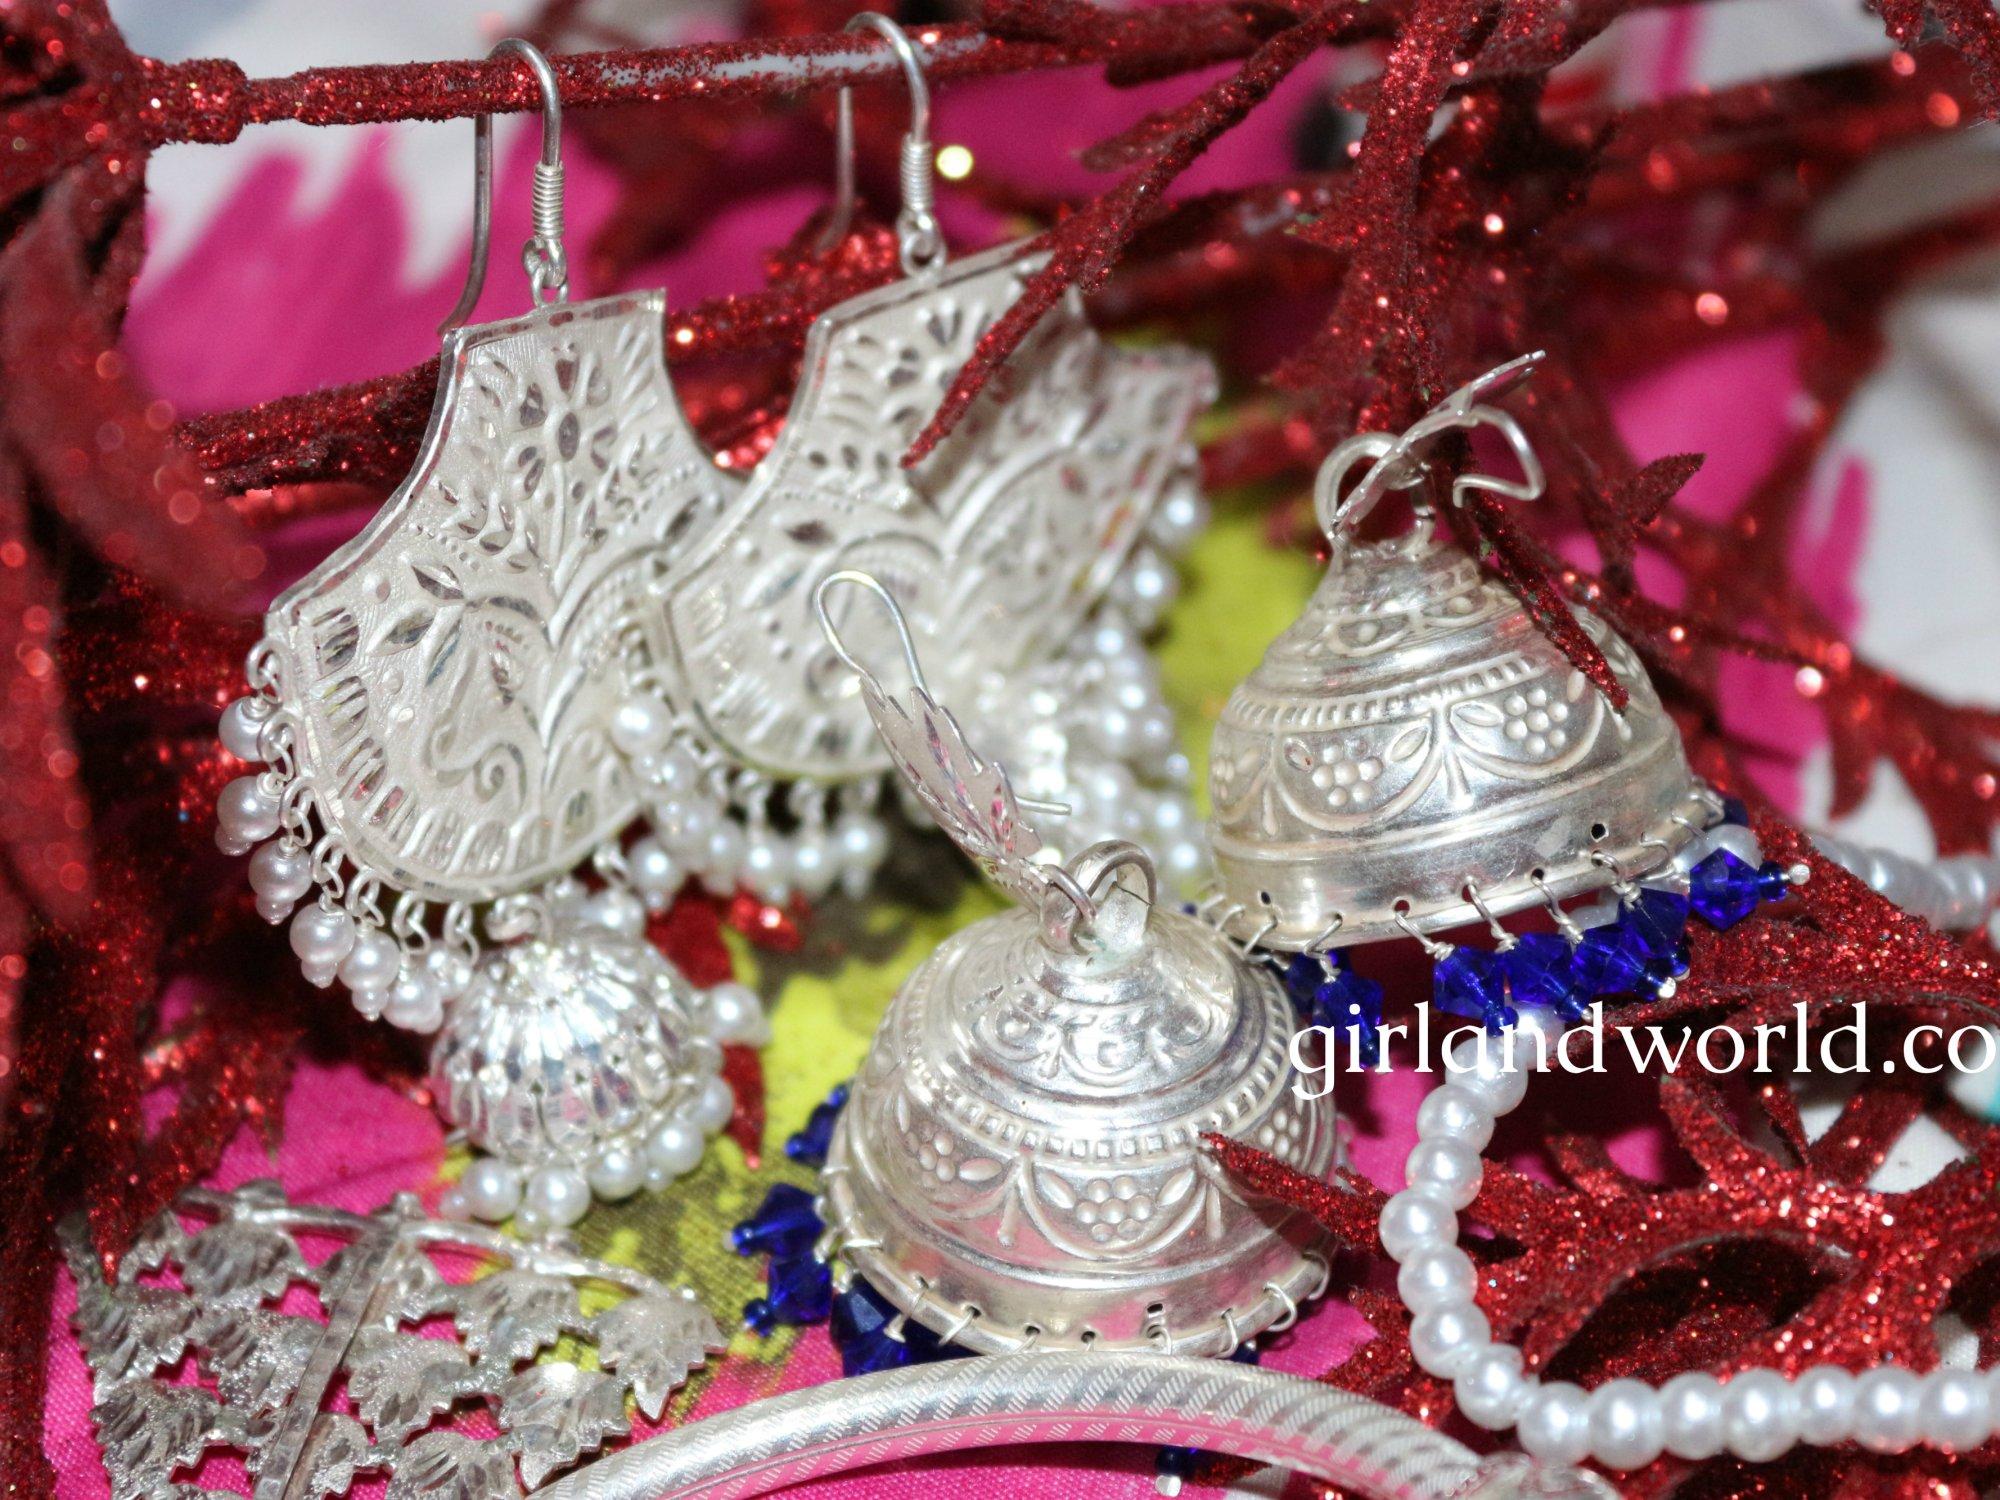 Navrtatra fashion silver jewelry Kashmir jewelry ethnic accessories jammu jewelry dogri traditional jewelry beautiful designs of jewelry indian jewelery silver jewelry silver price silver dsigns silver use silver bracelets silver earrings sliver jhumki